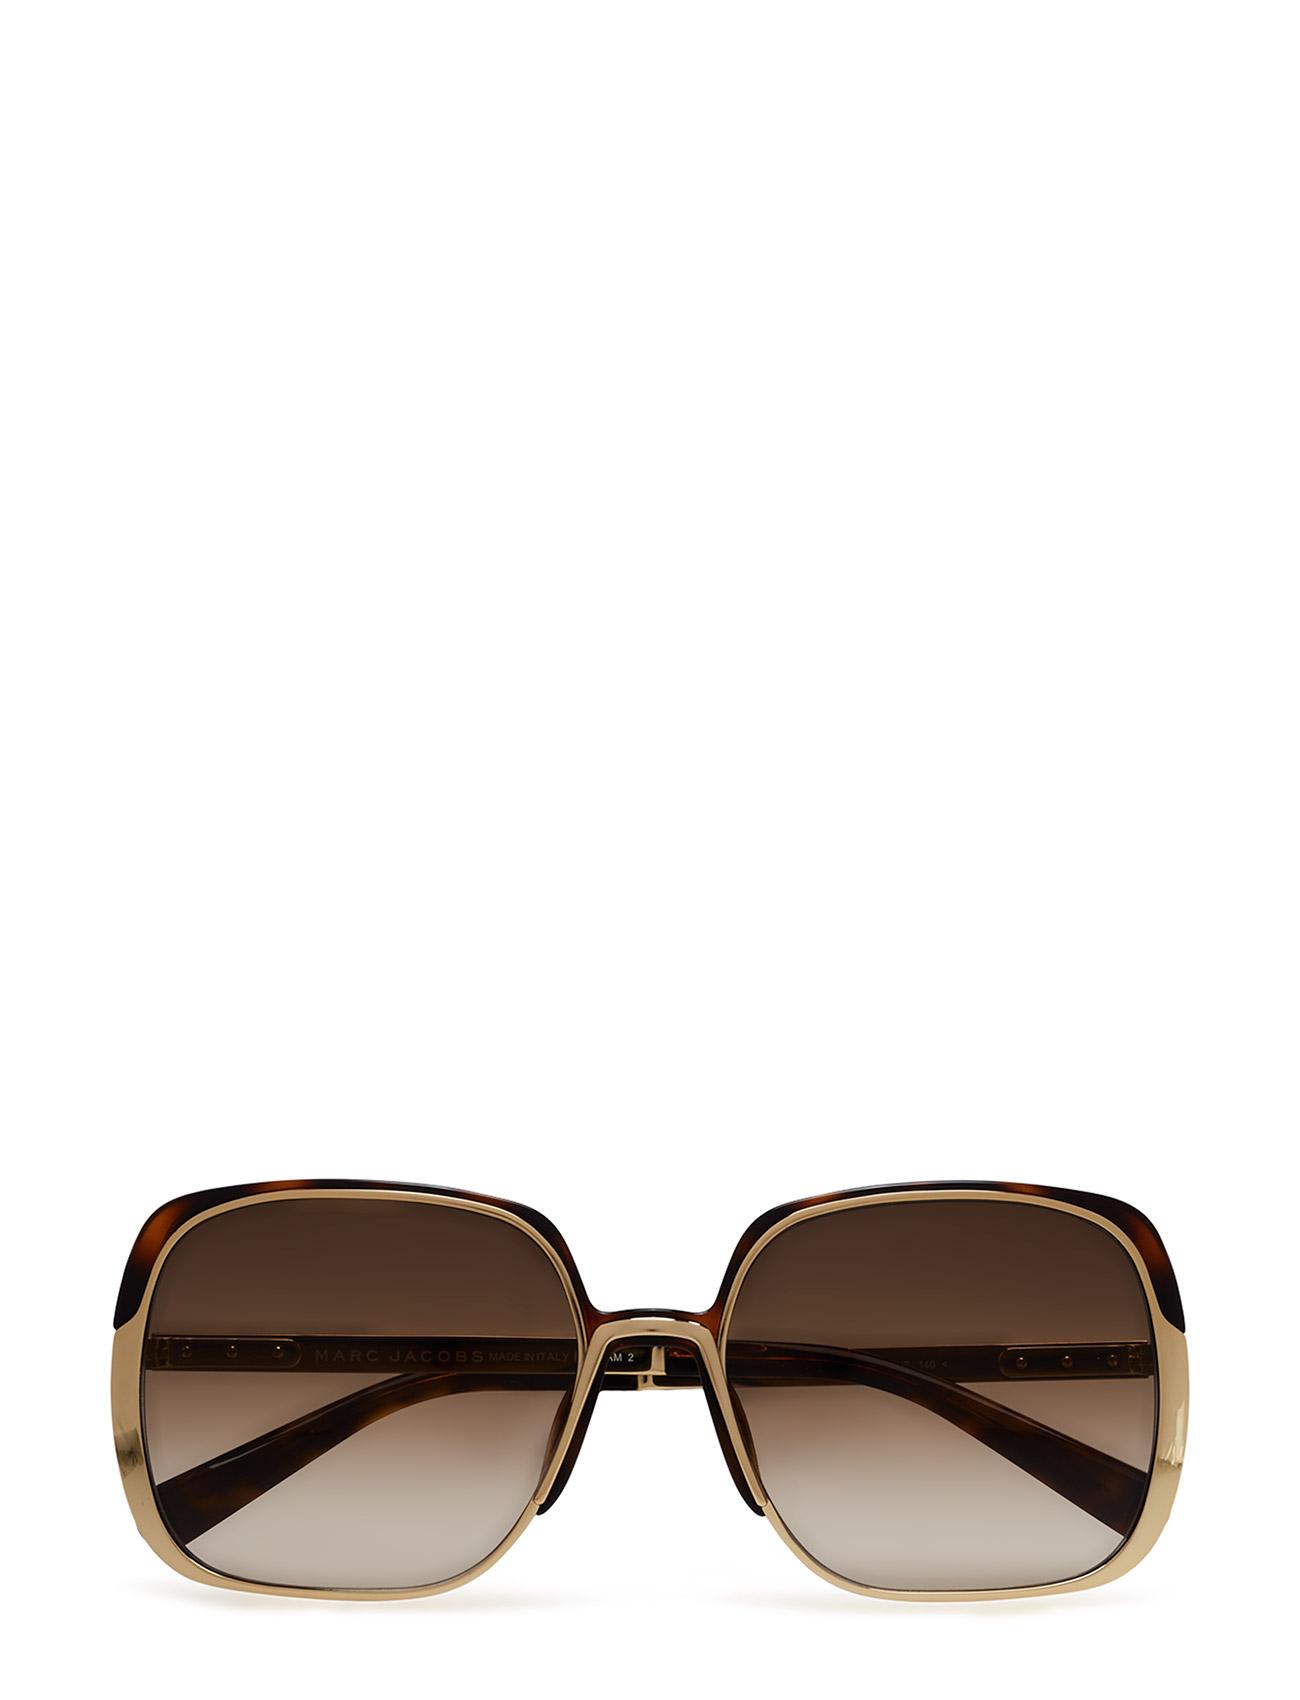 Mj 622/S Marc Jacobs Sunglasses Solbriller til Damer i